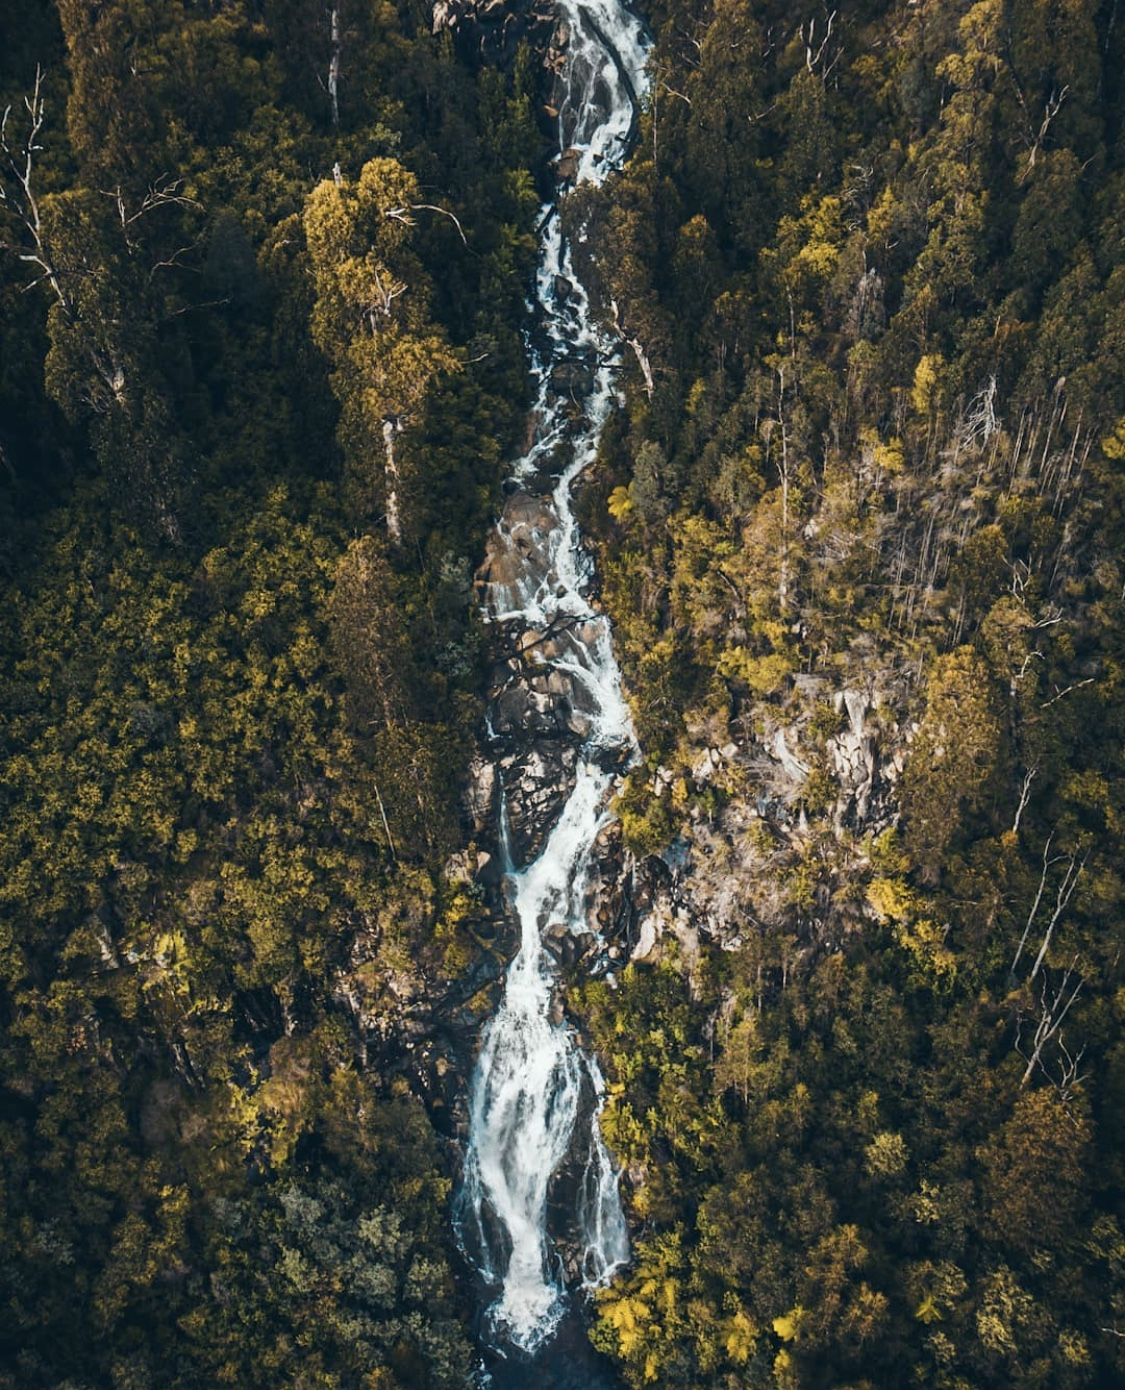 Travis Yarra Valley Guide - Steavenson Falls Trail